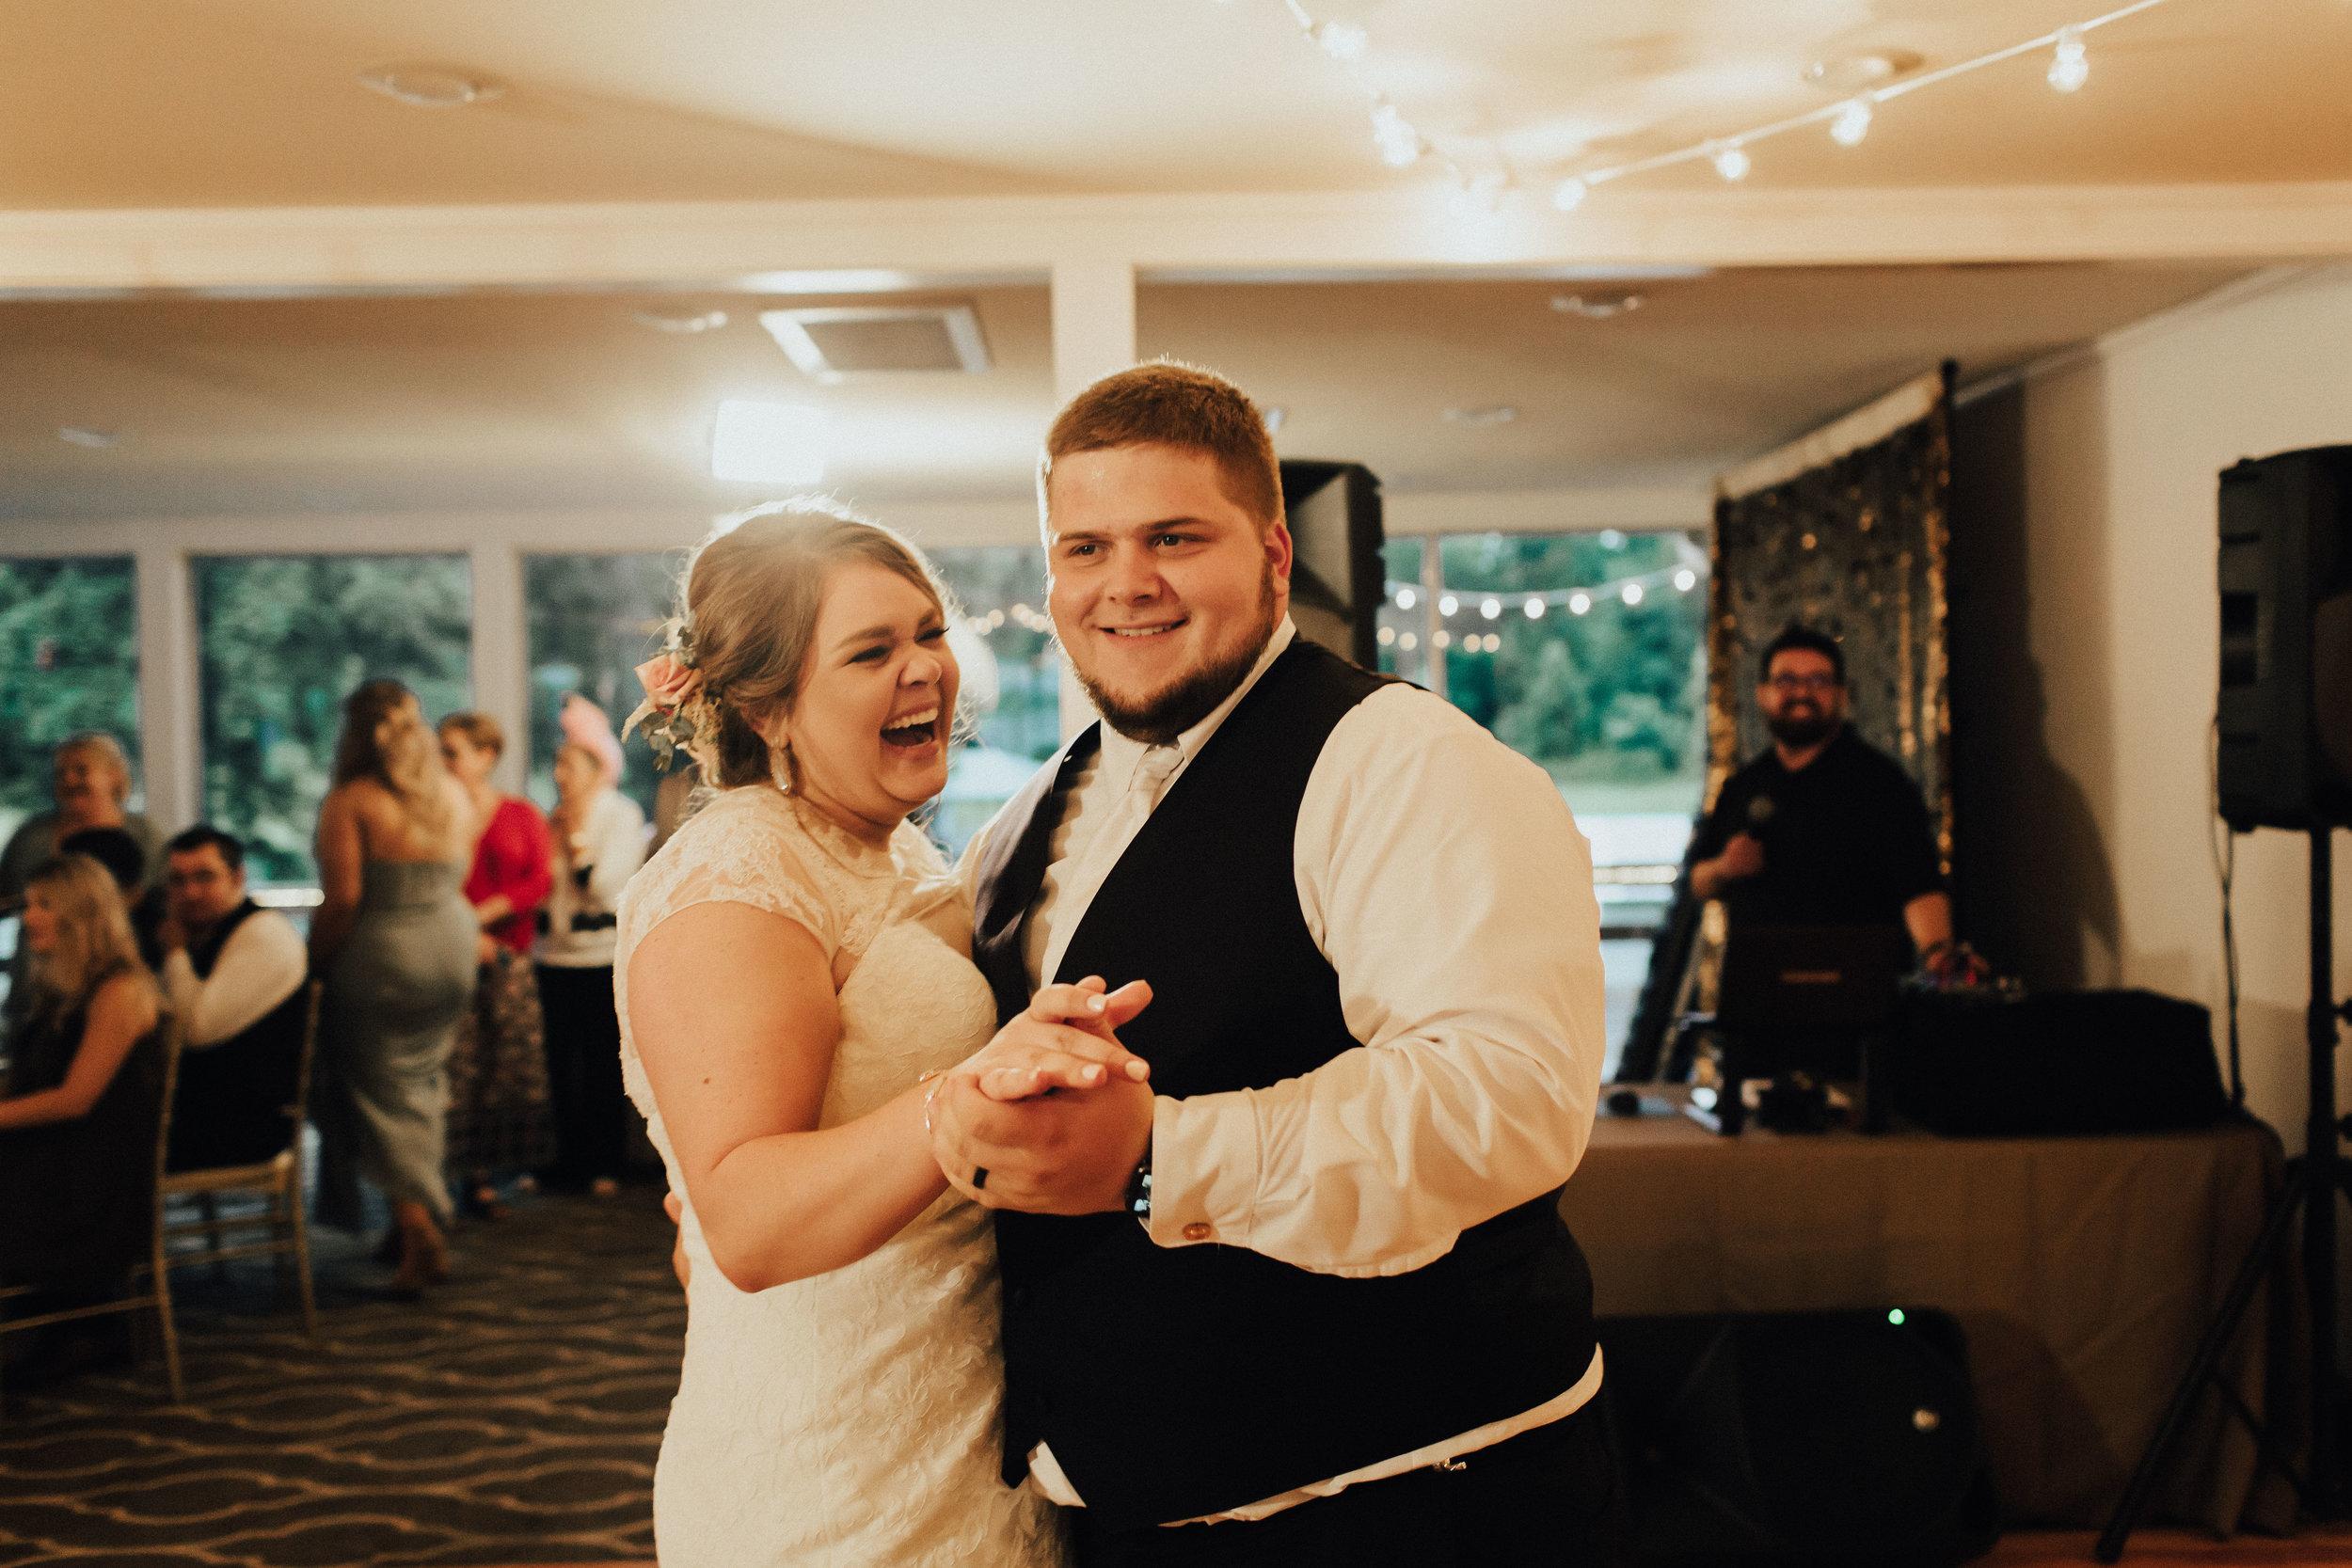 caitlin-jackson-wedding-photographer-lake-tyler-petroleum-club-texas--645.jpg